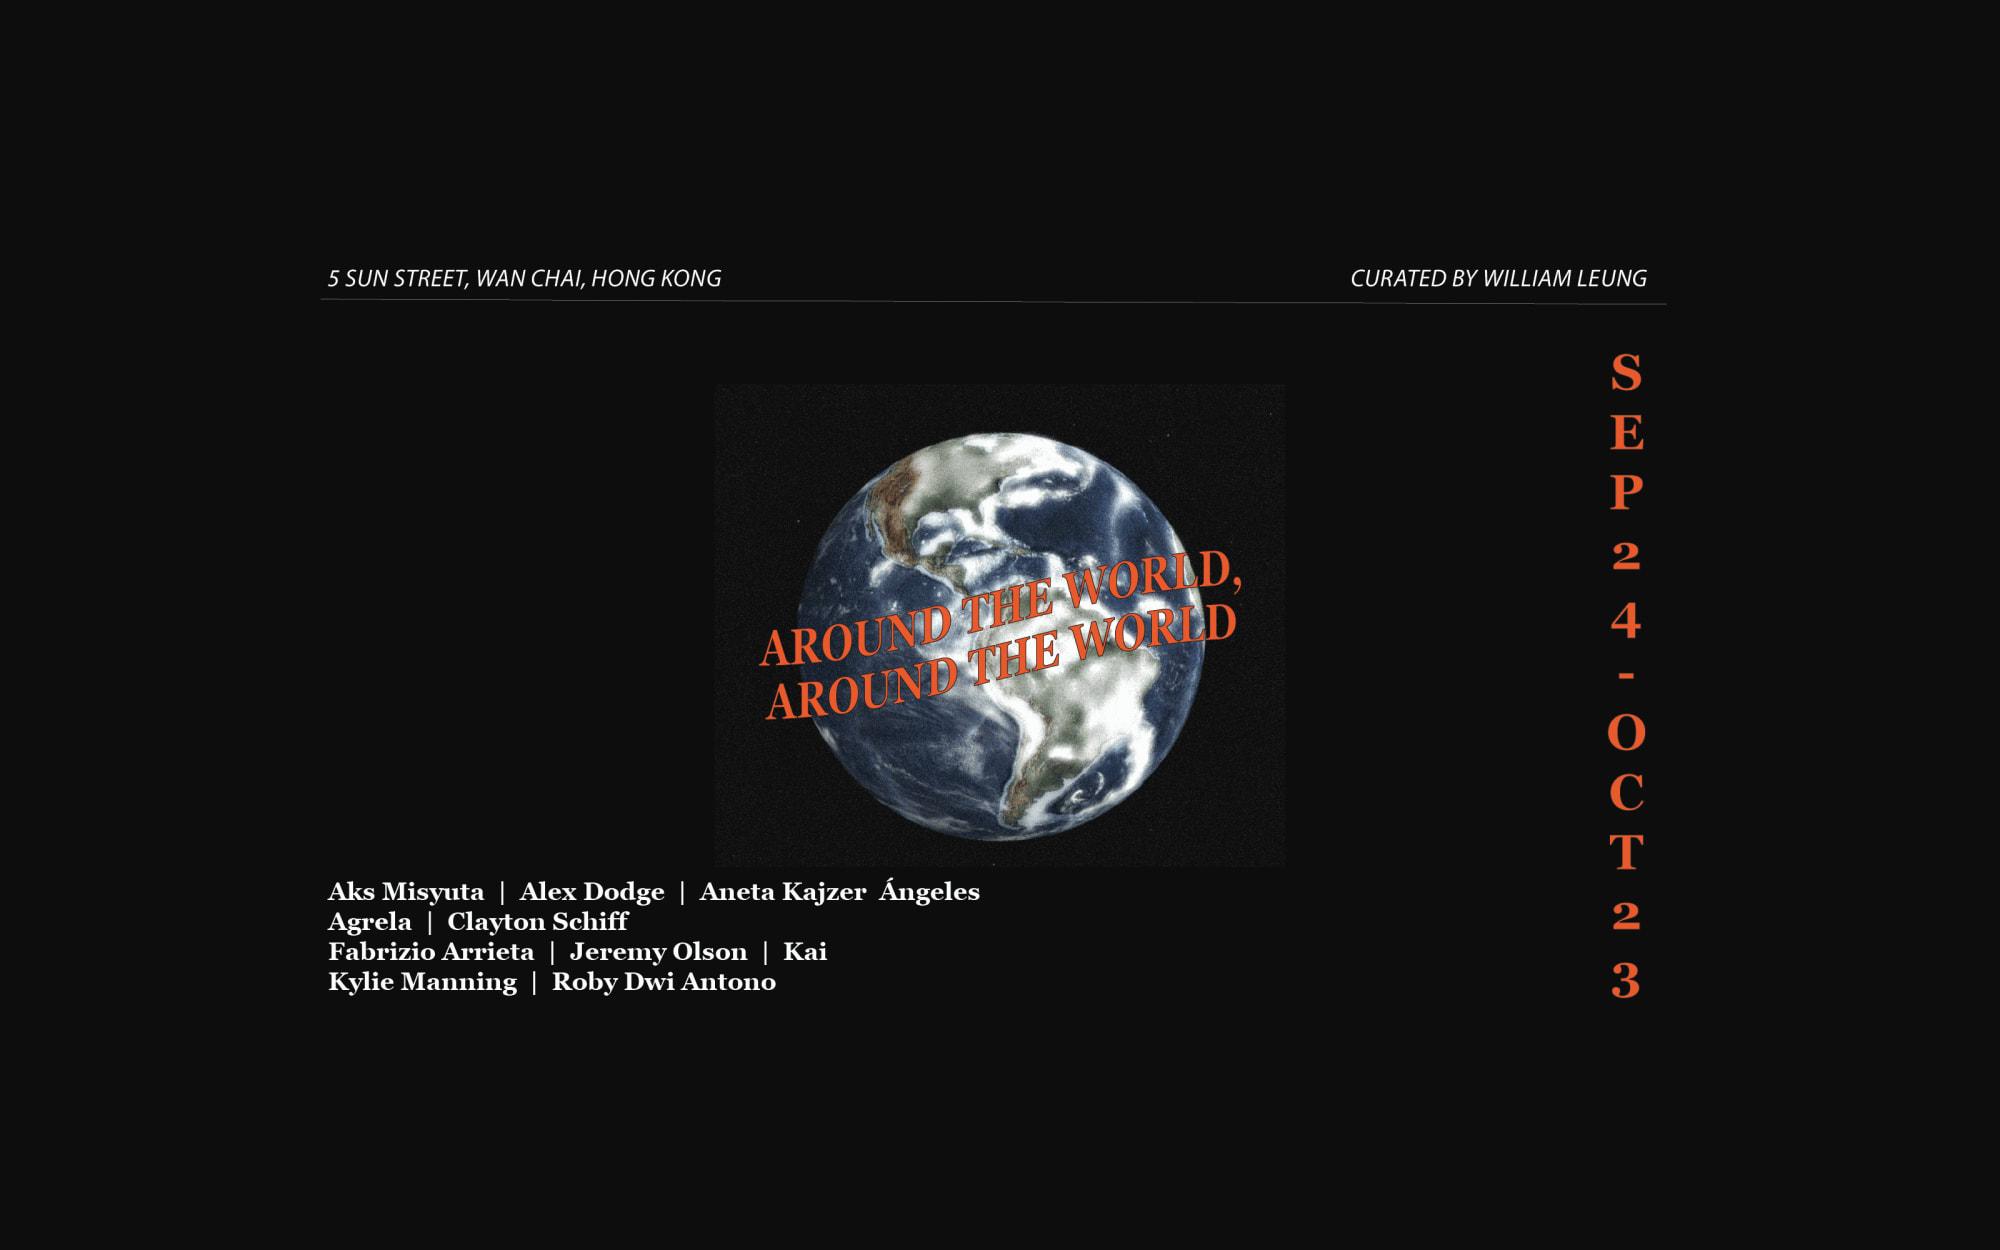 Around the World, Around the World – Curated by William Leung